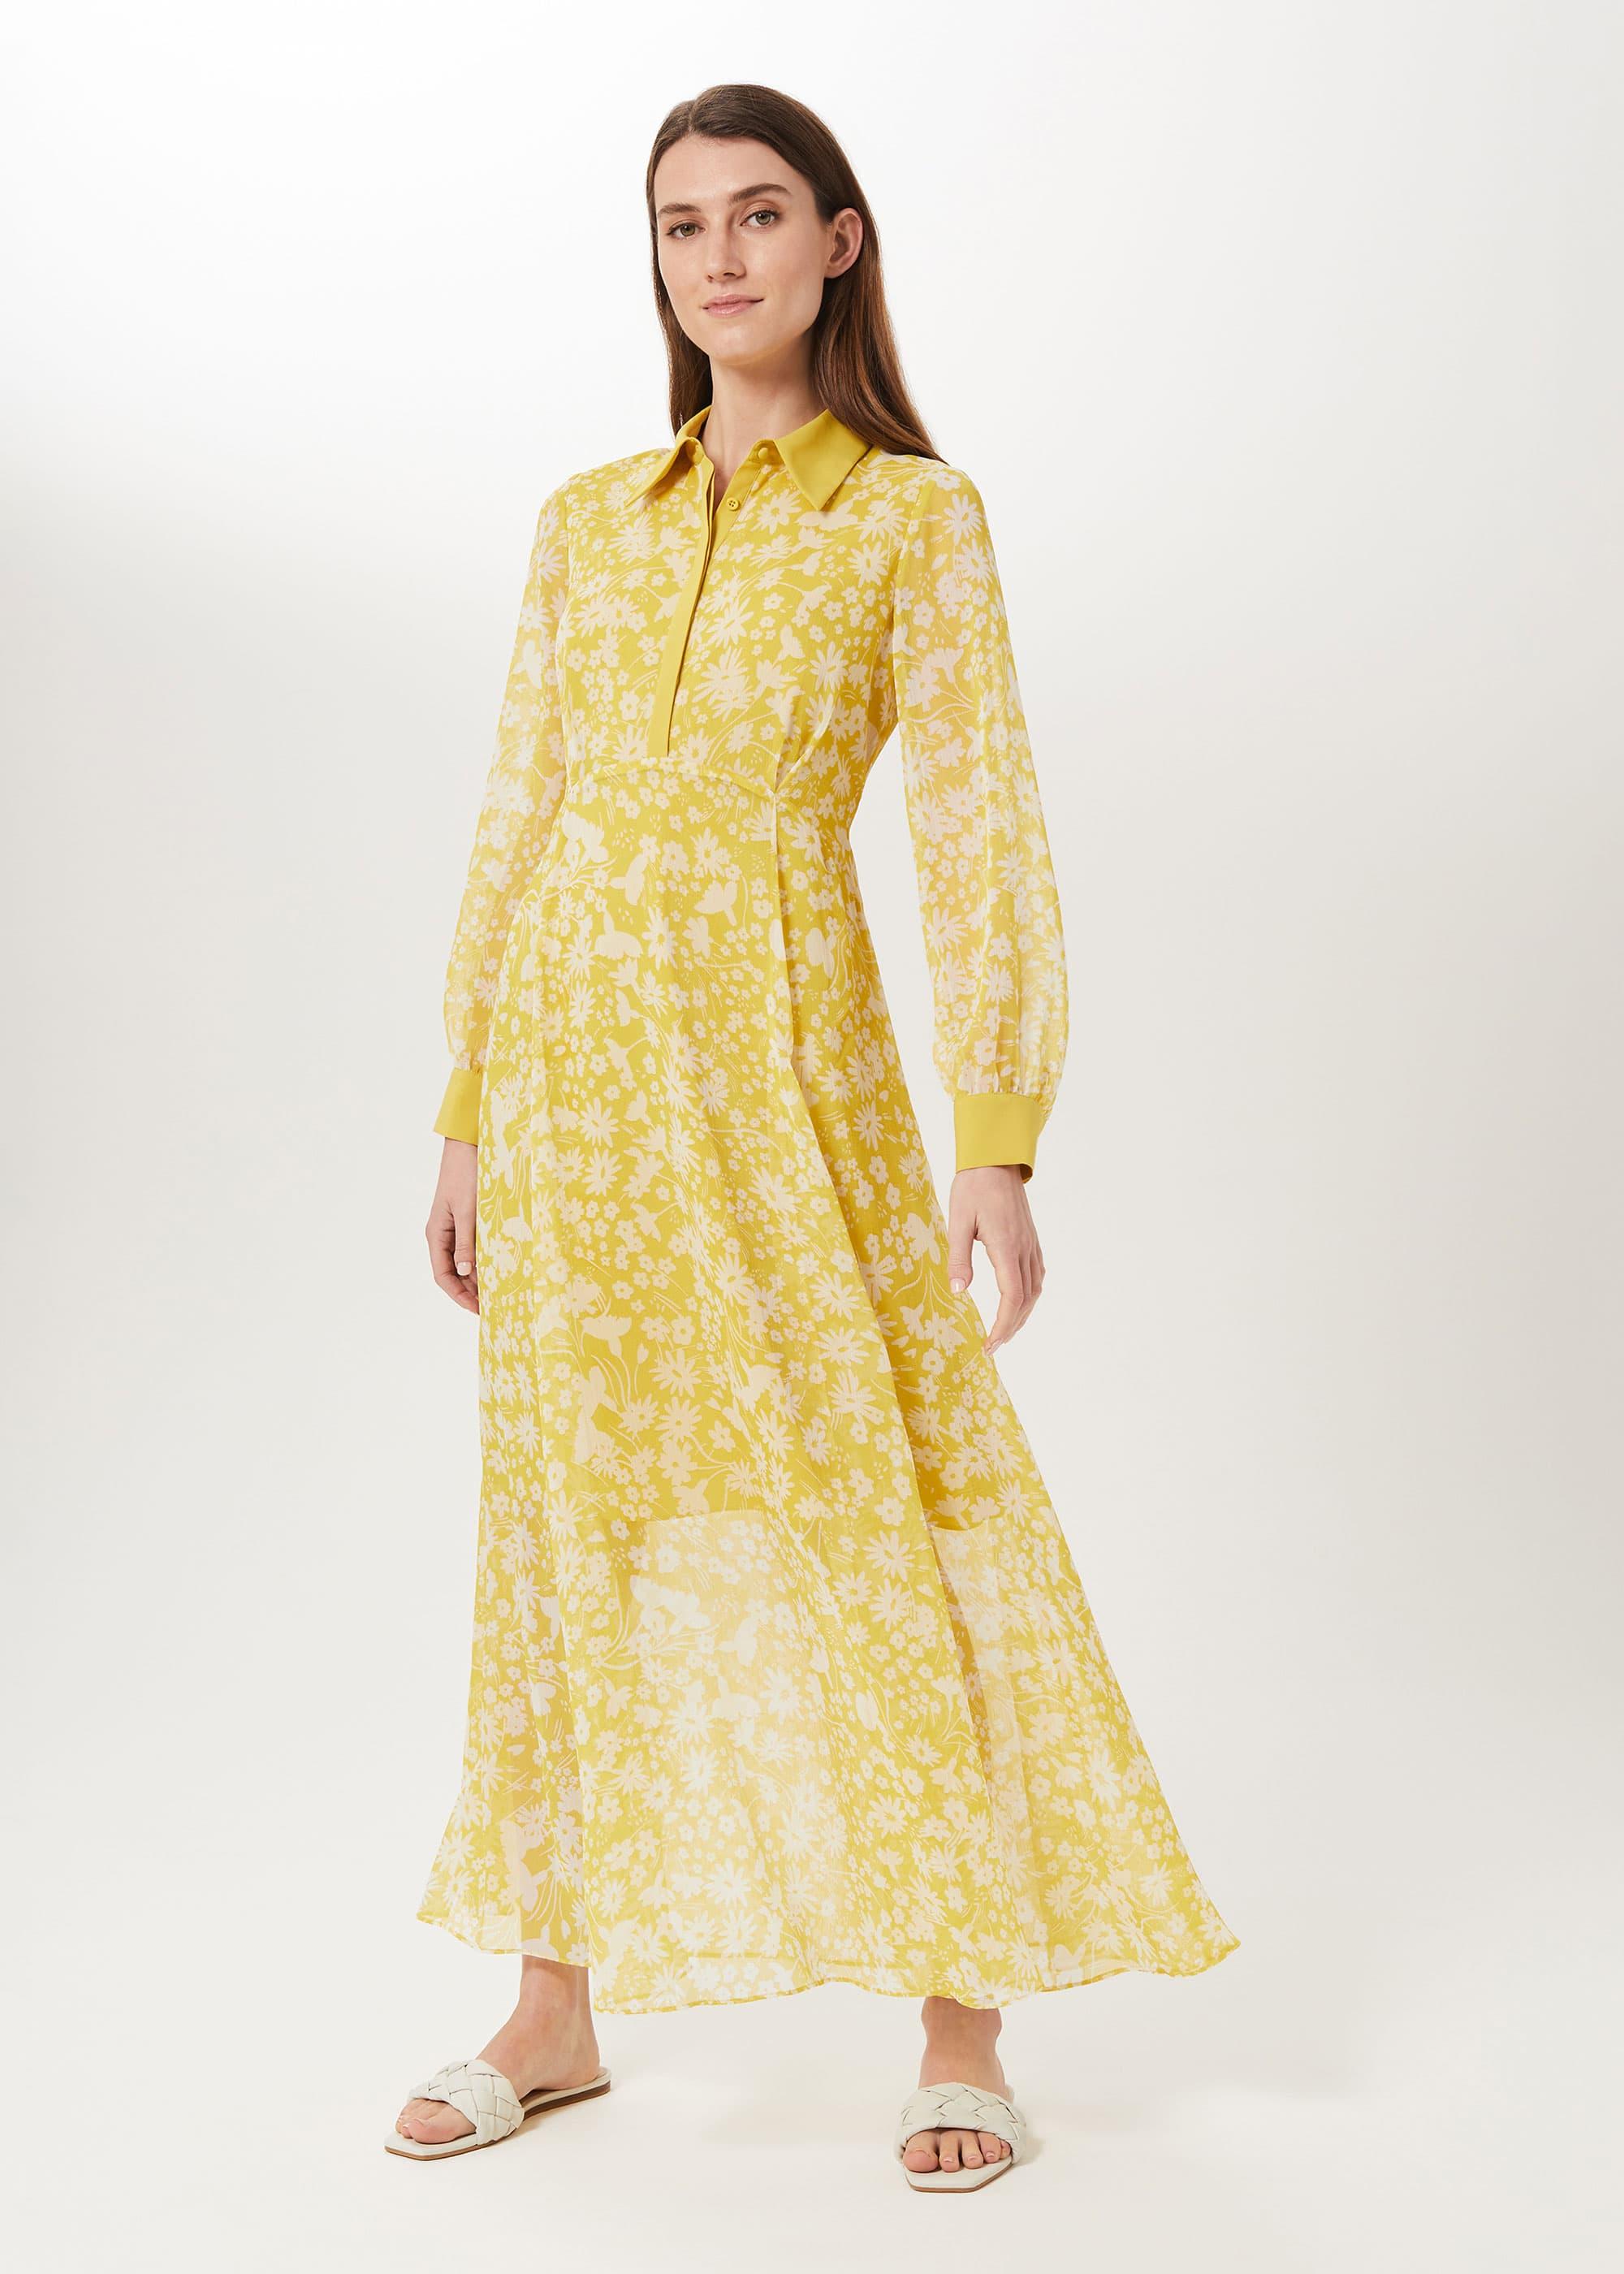 Hobbs Women Claudine Floral Dress